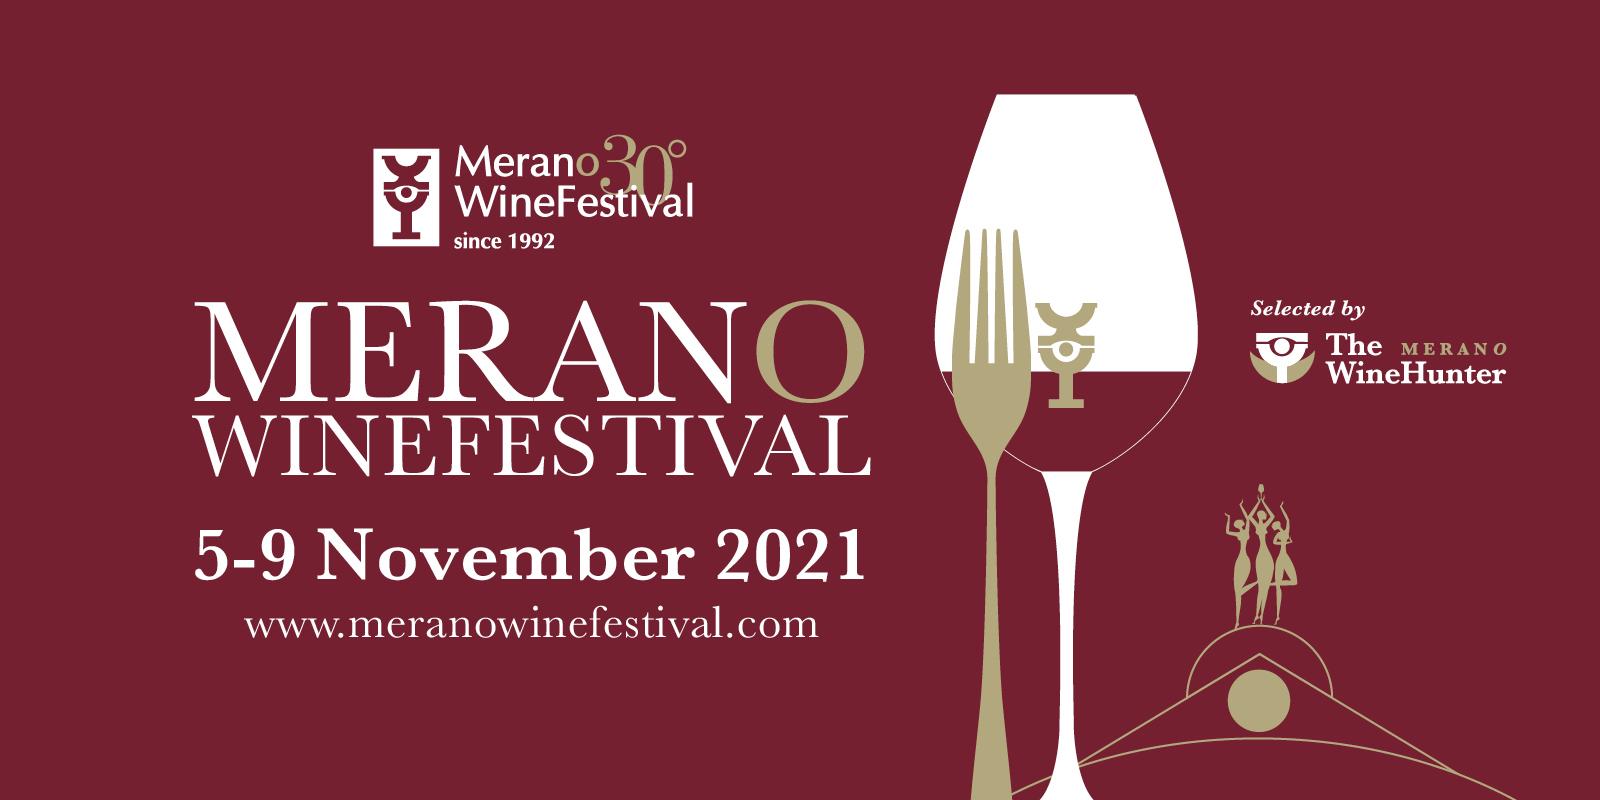 Merano WineFestival 5-9 November 2021